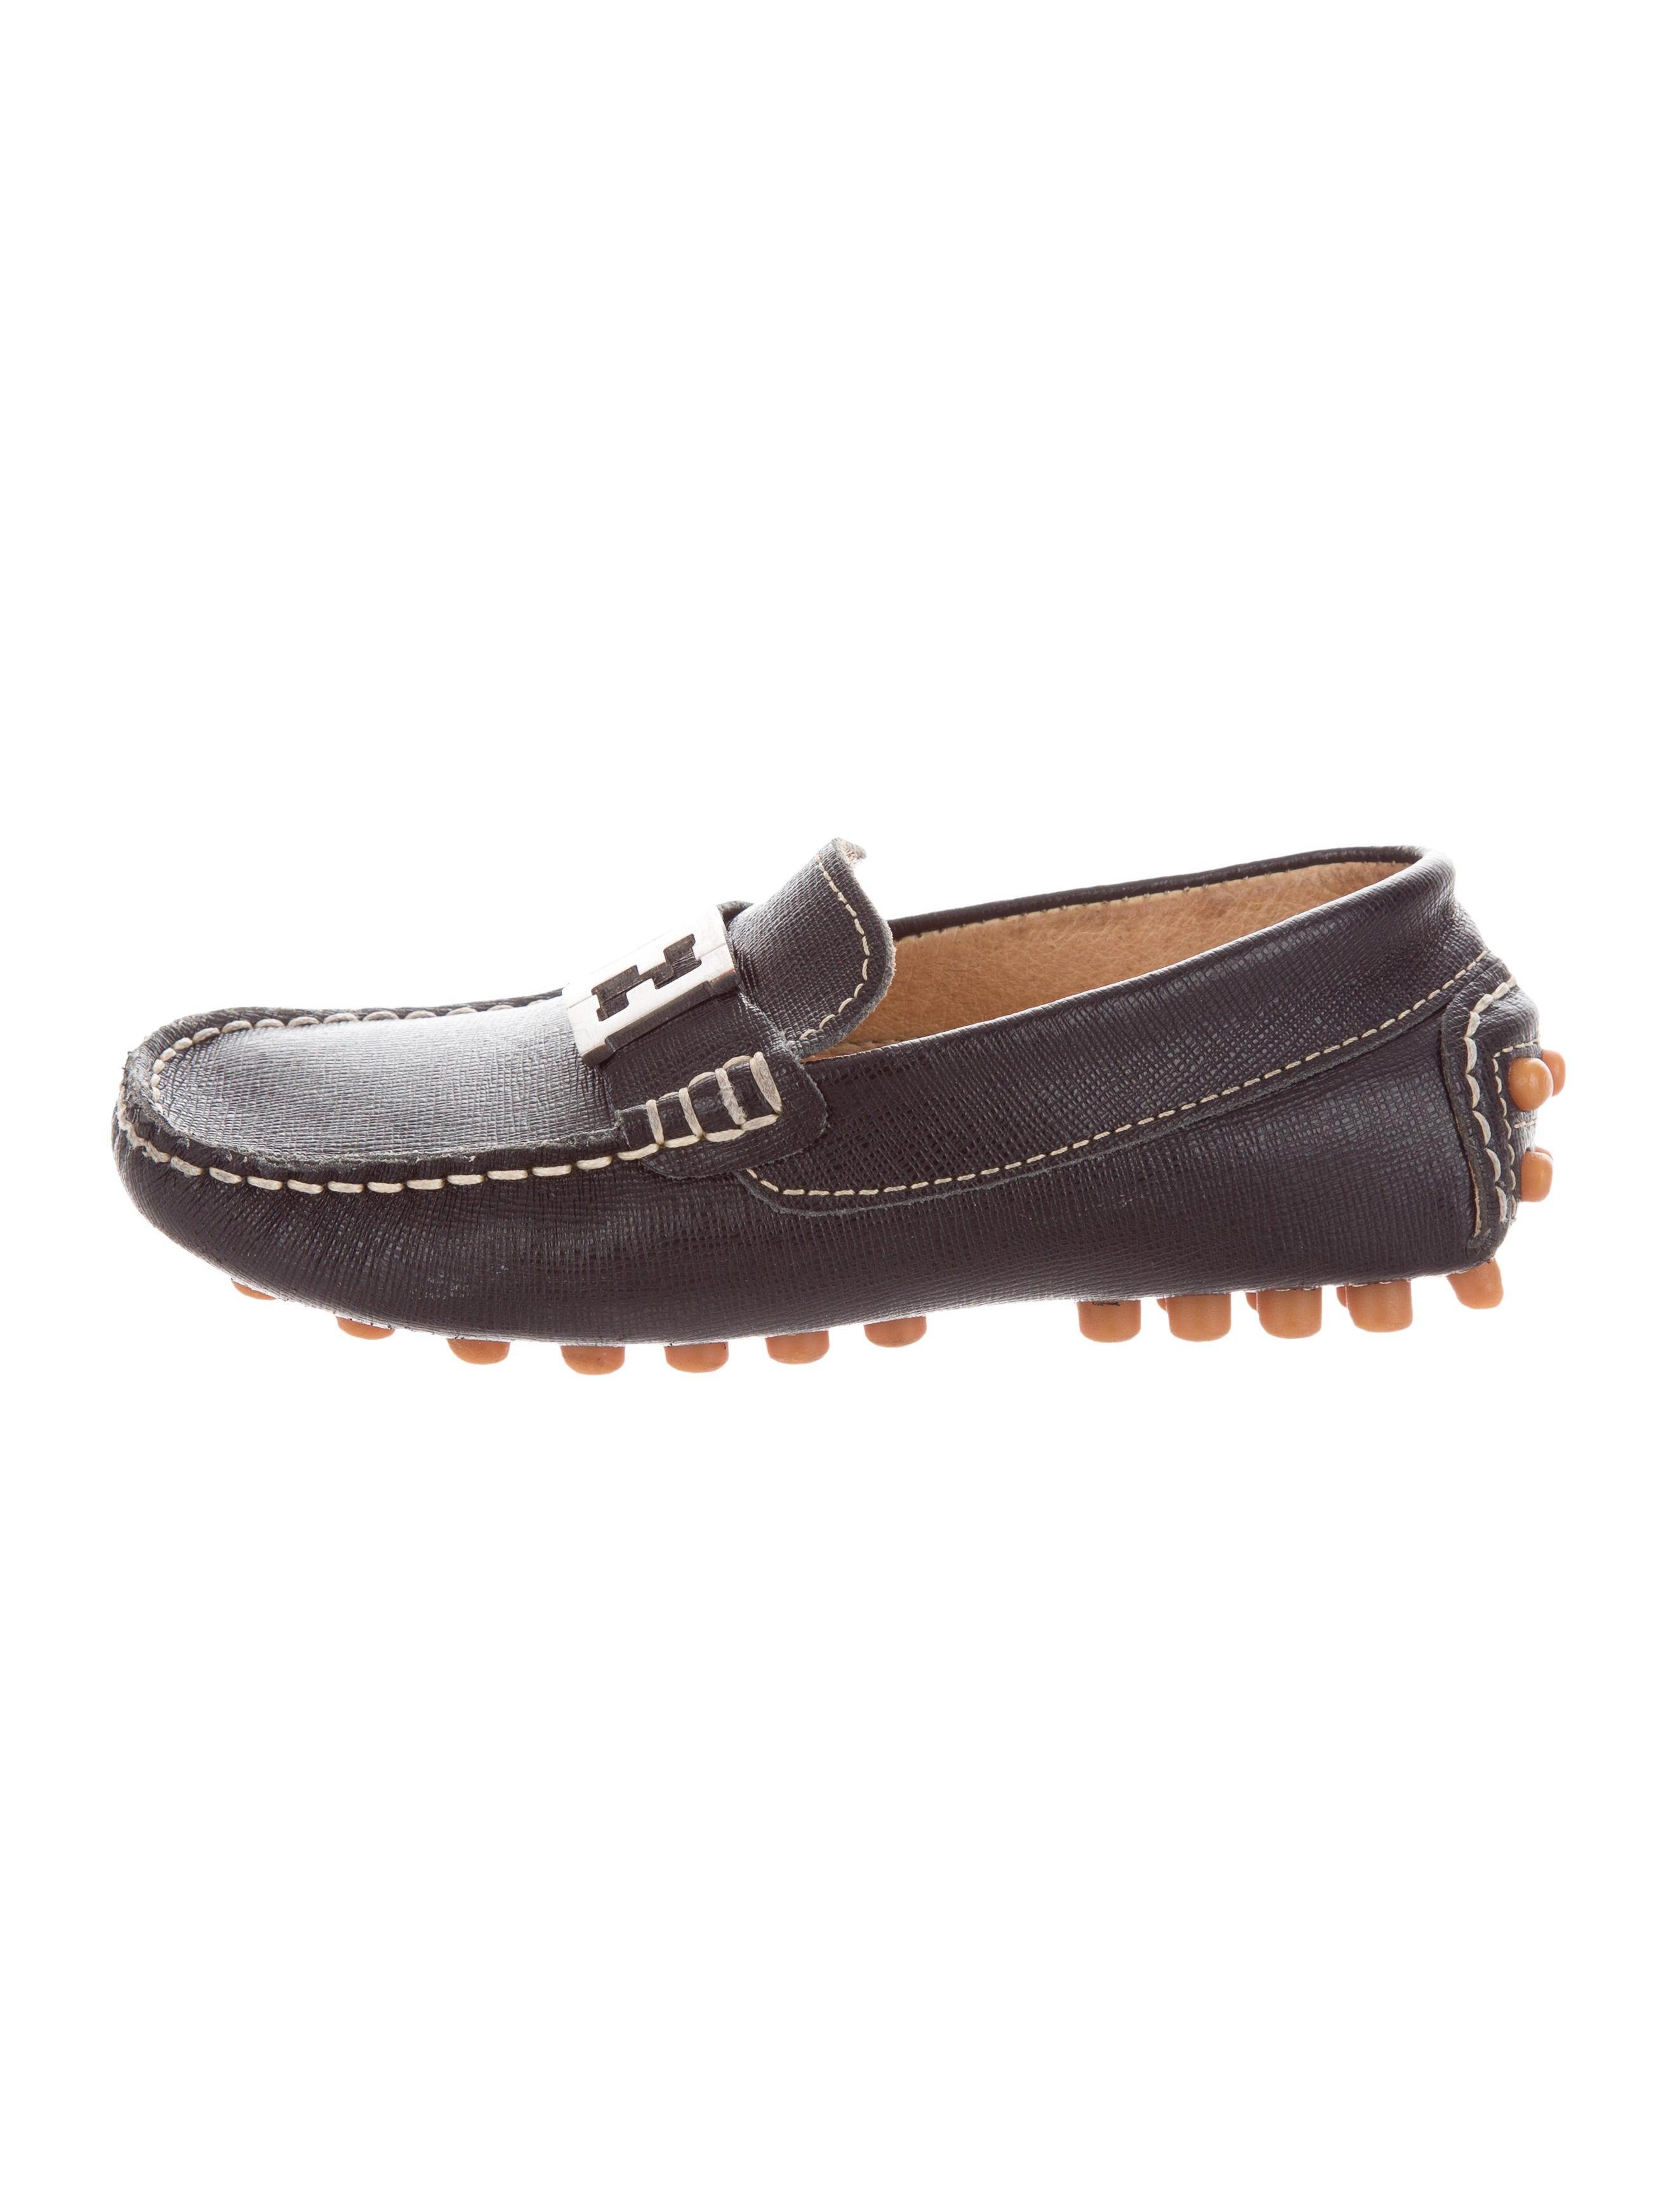 bbd069095aa Fendi boys leather zucca embellished loafers boys fen jpg 2642x3485 Fendi  loafers